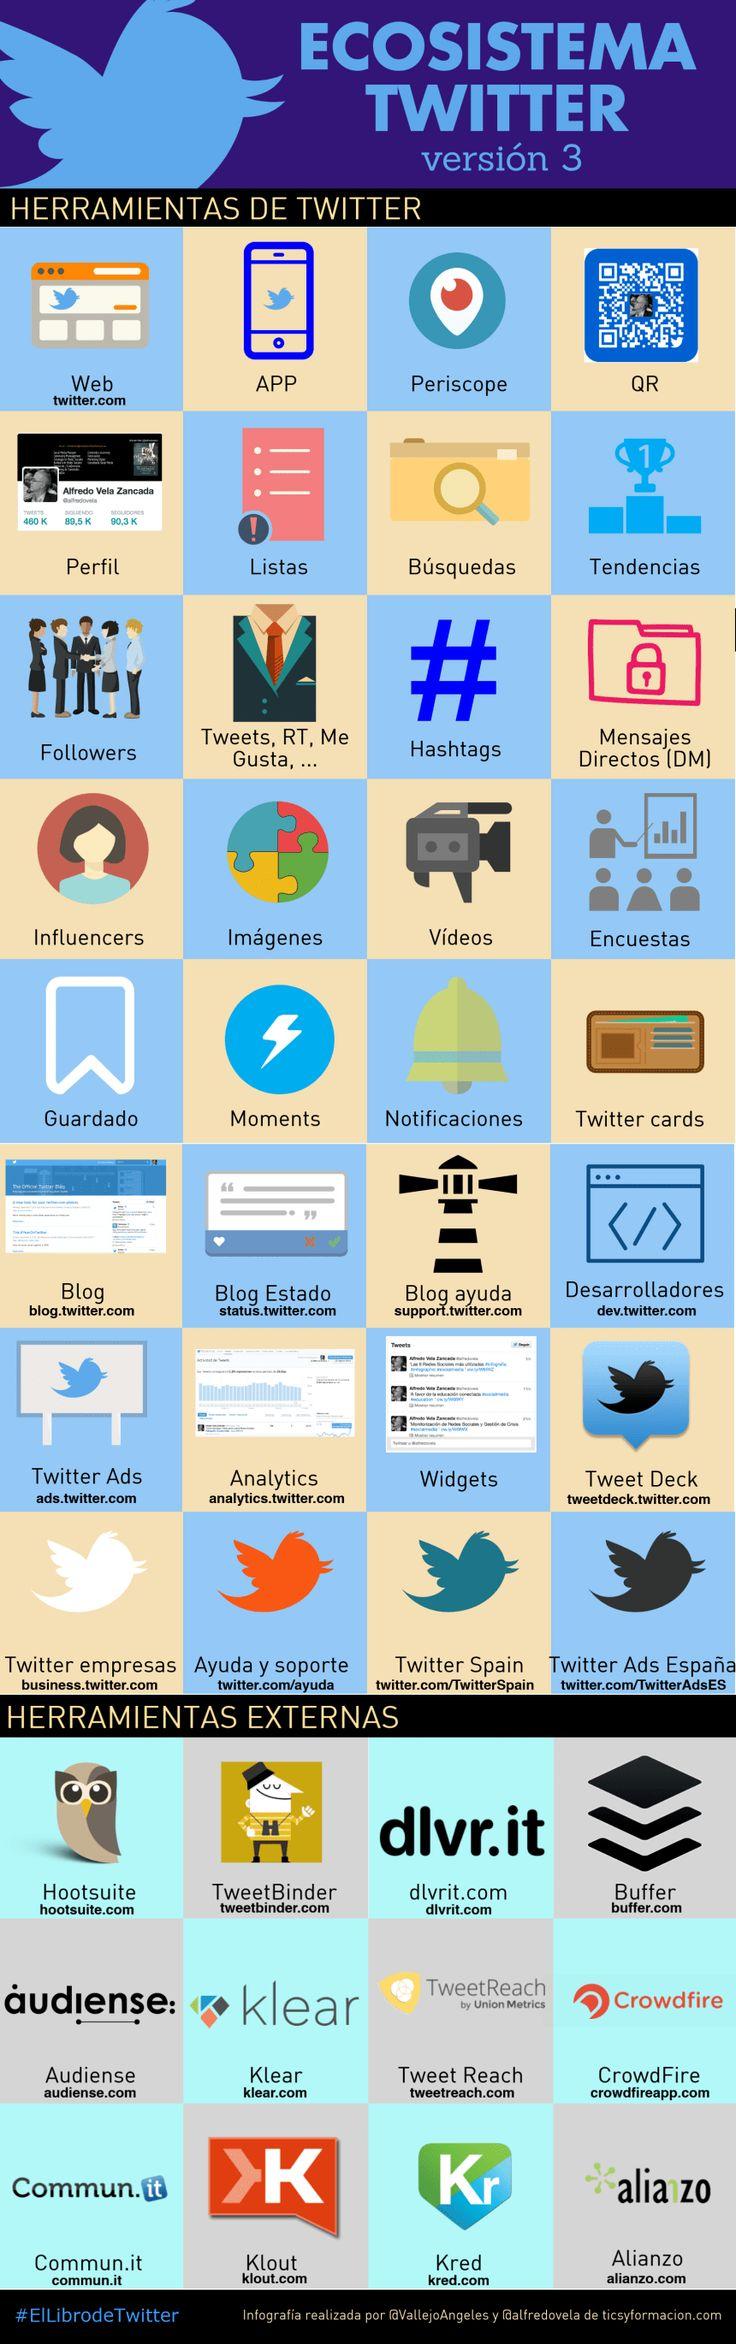 Ecosistema Twitter (versión 3) #infografia